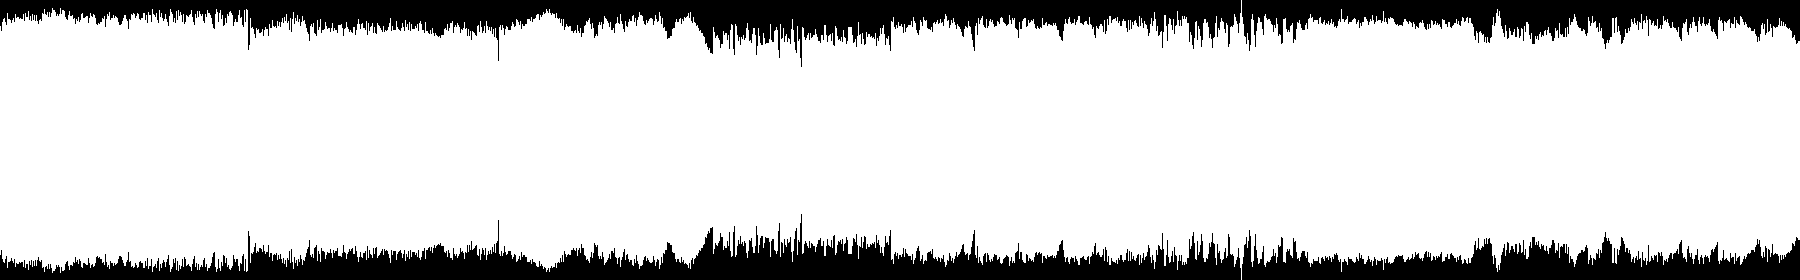 Synthmorph Diva Chomolungma audio waveform